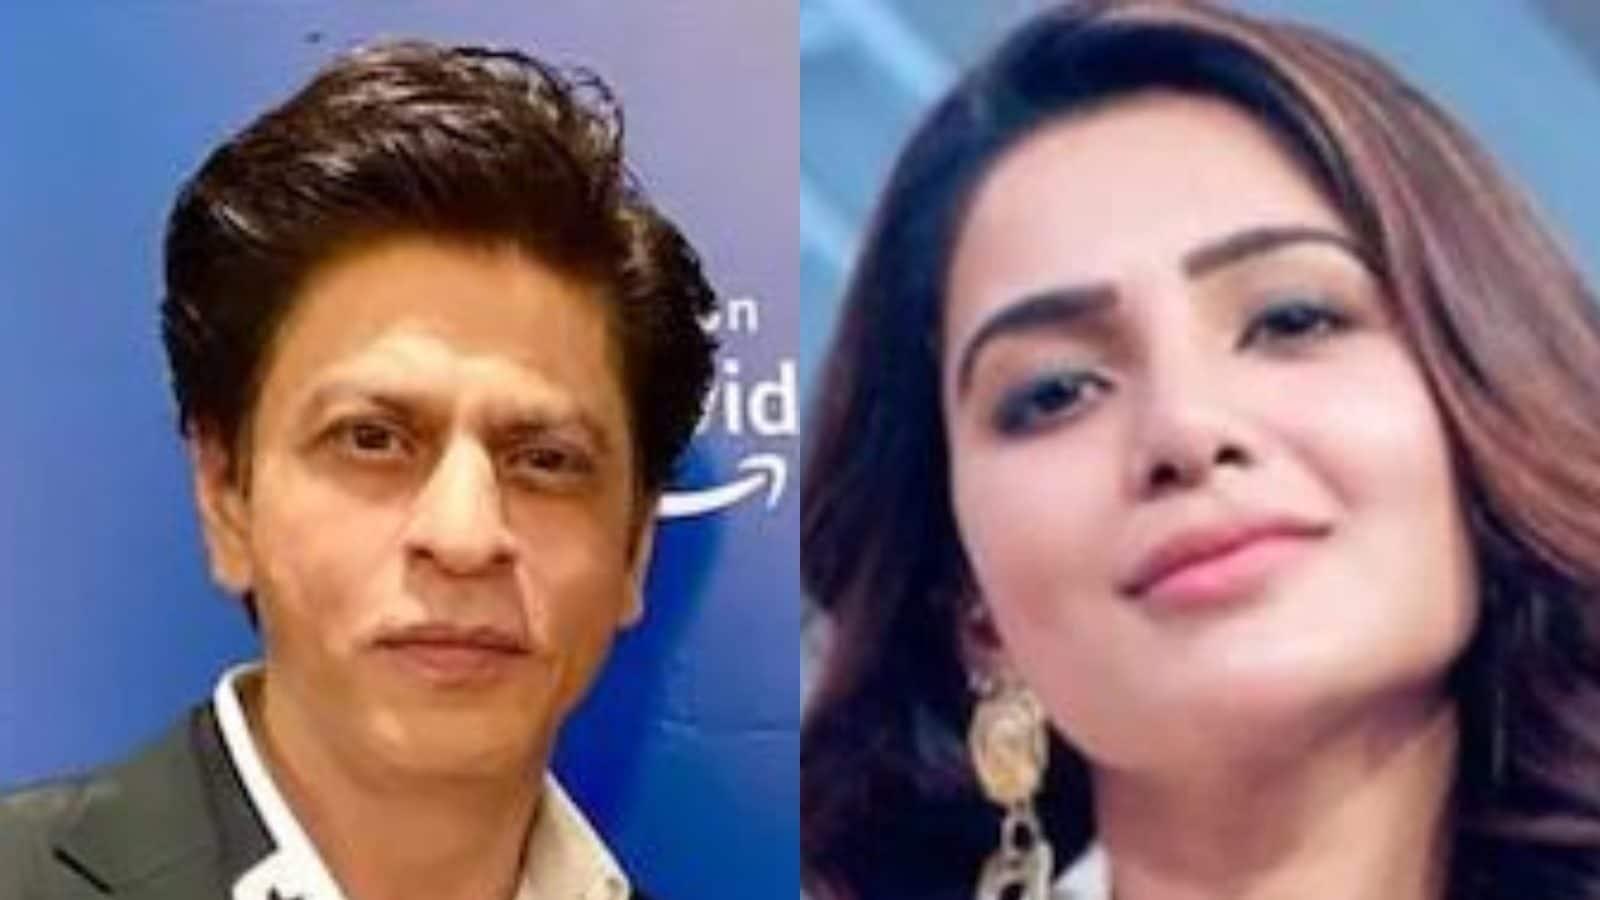 Samantha Akkineni Cheers for Dhaakad, Shah Rukh Khan, Salman Khan Call Off Shoots Amid Aryan Khan Case